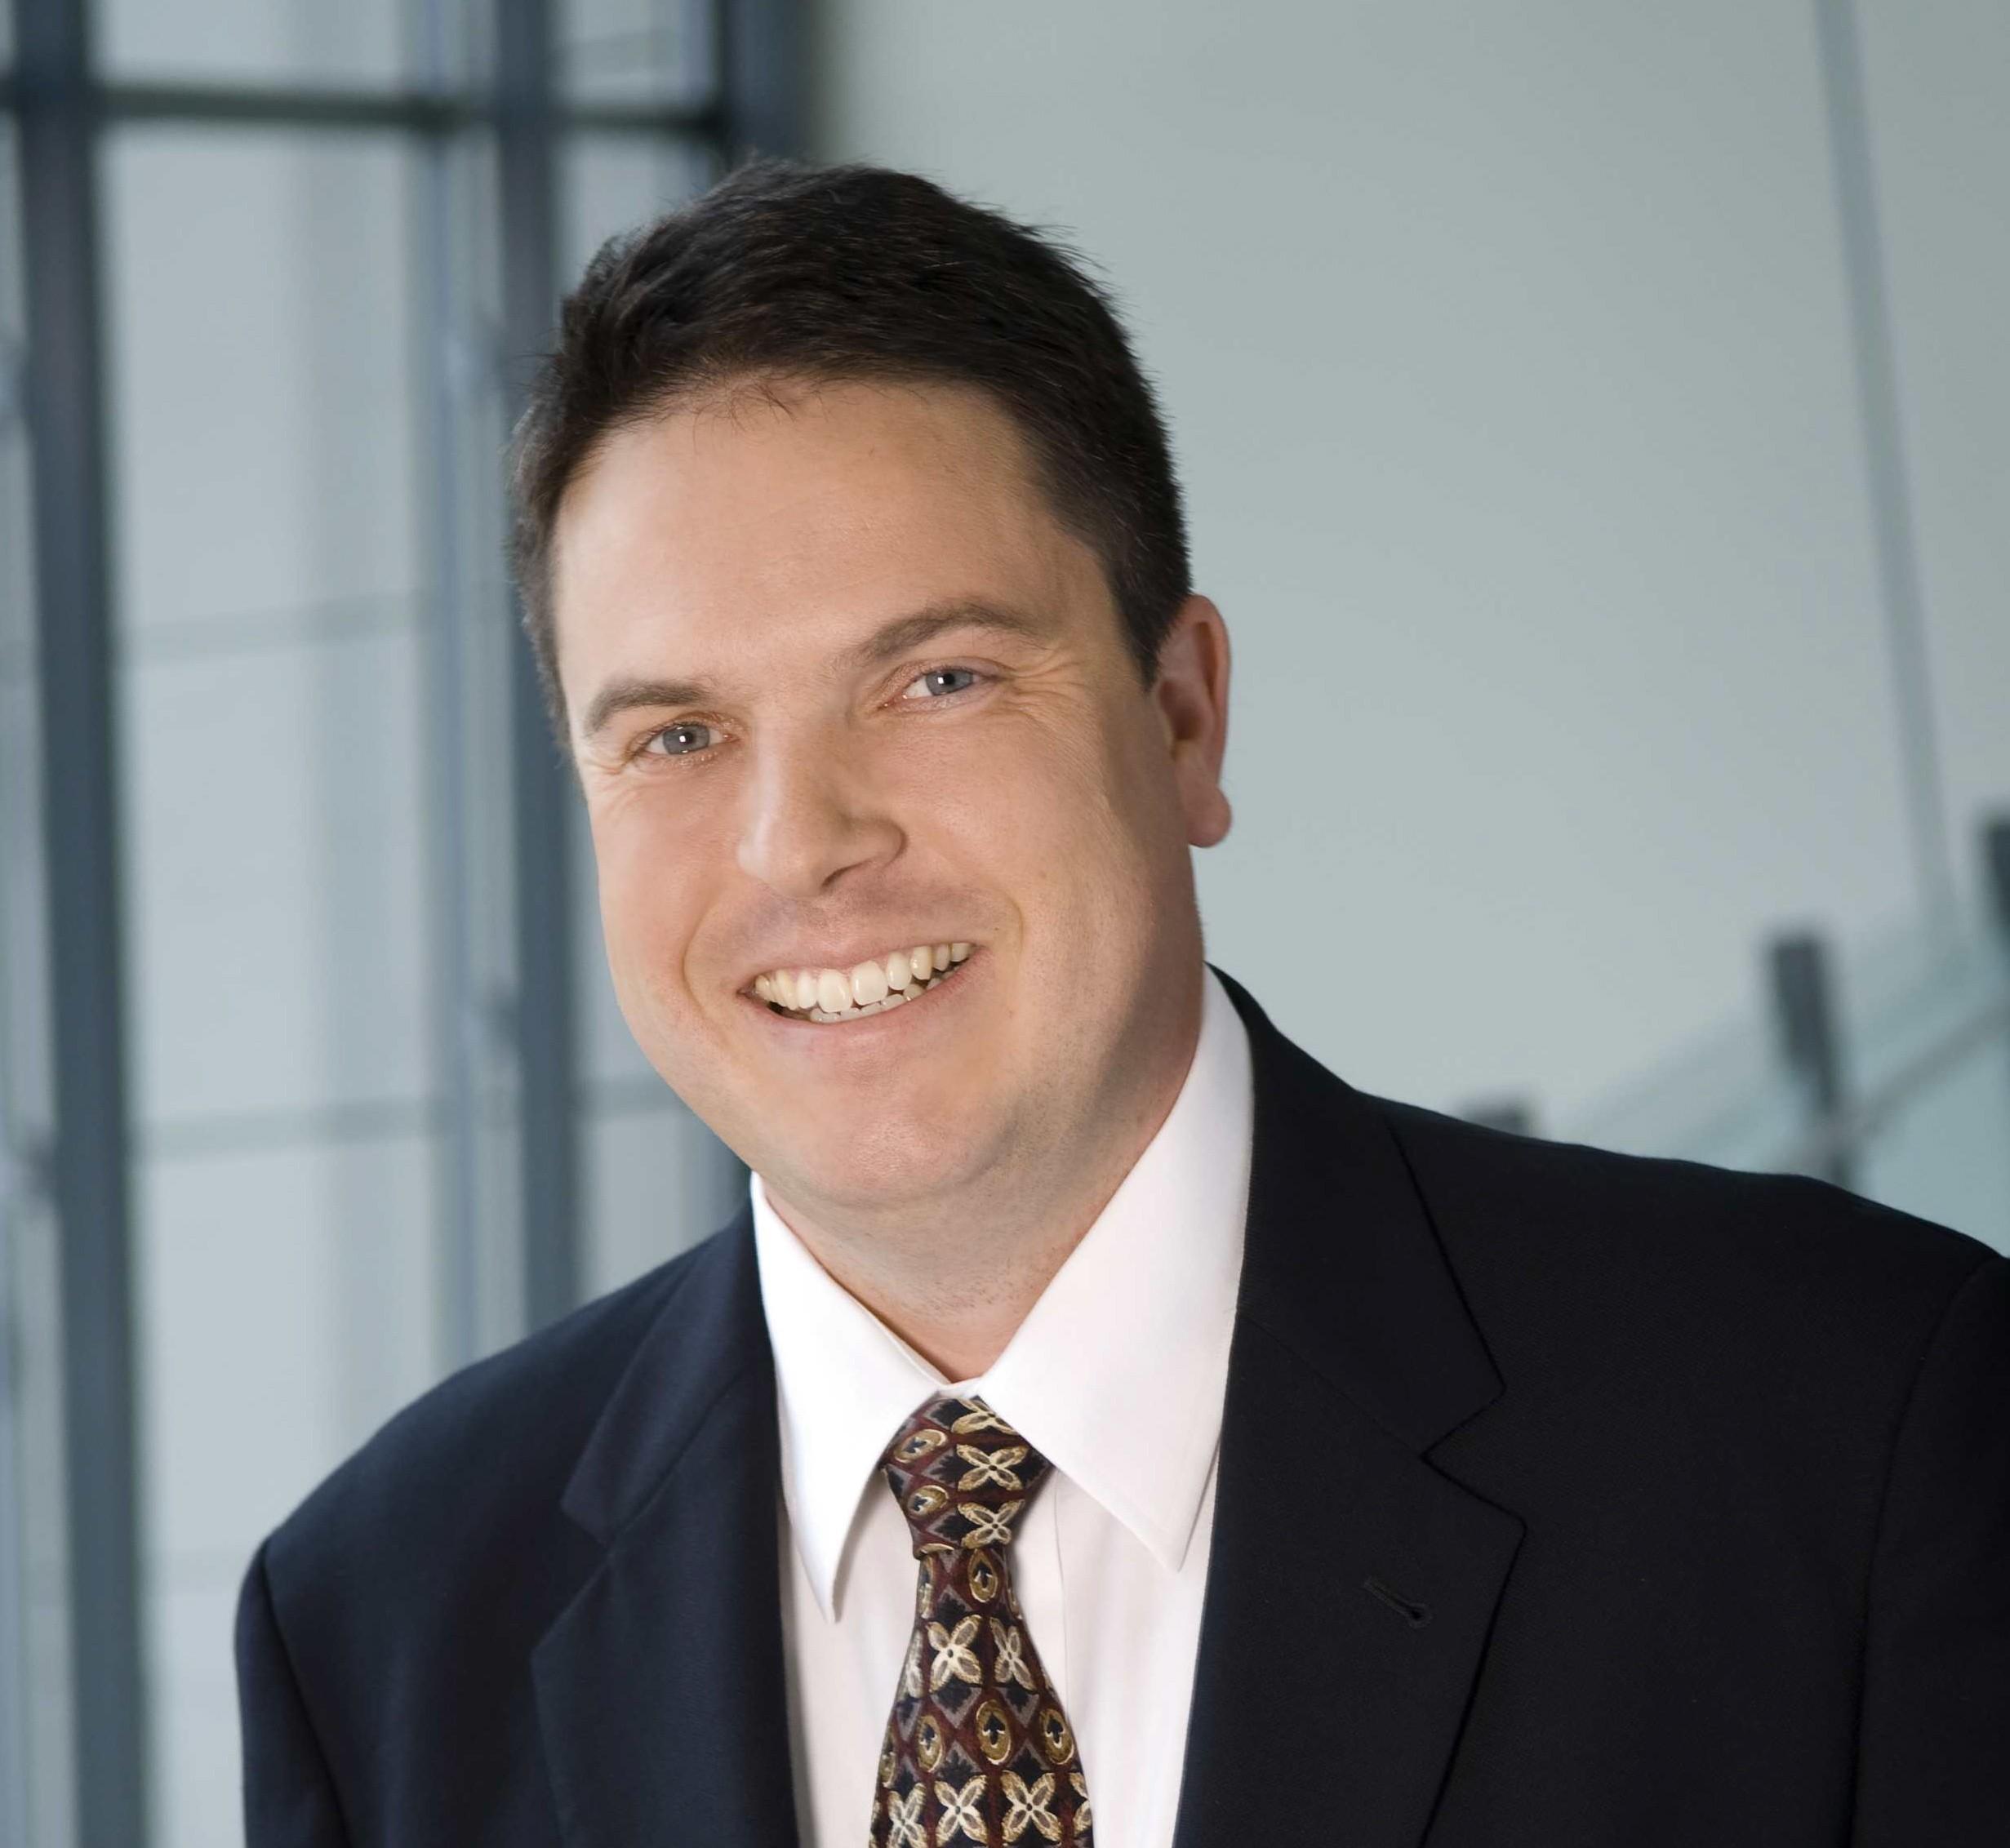 High-resolution headshot of Matt Grob, EVP & CTO